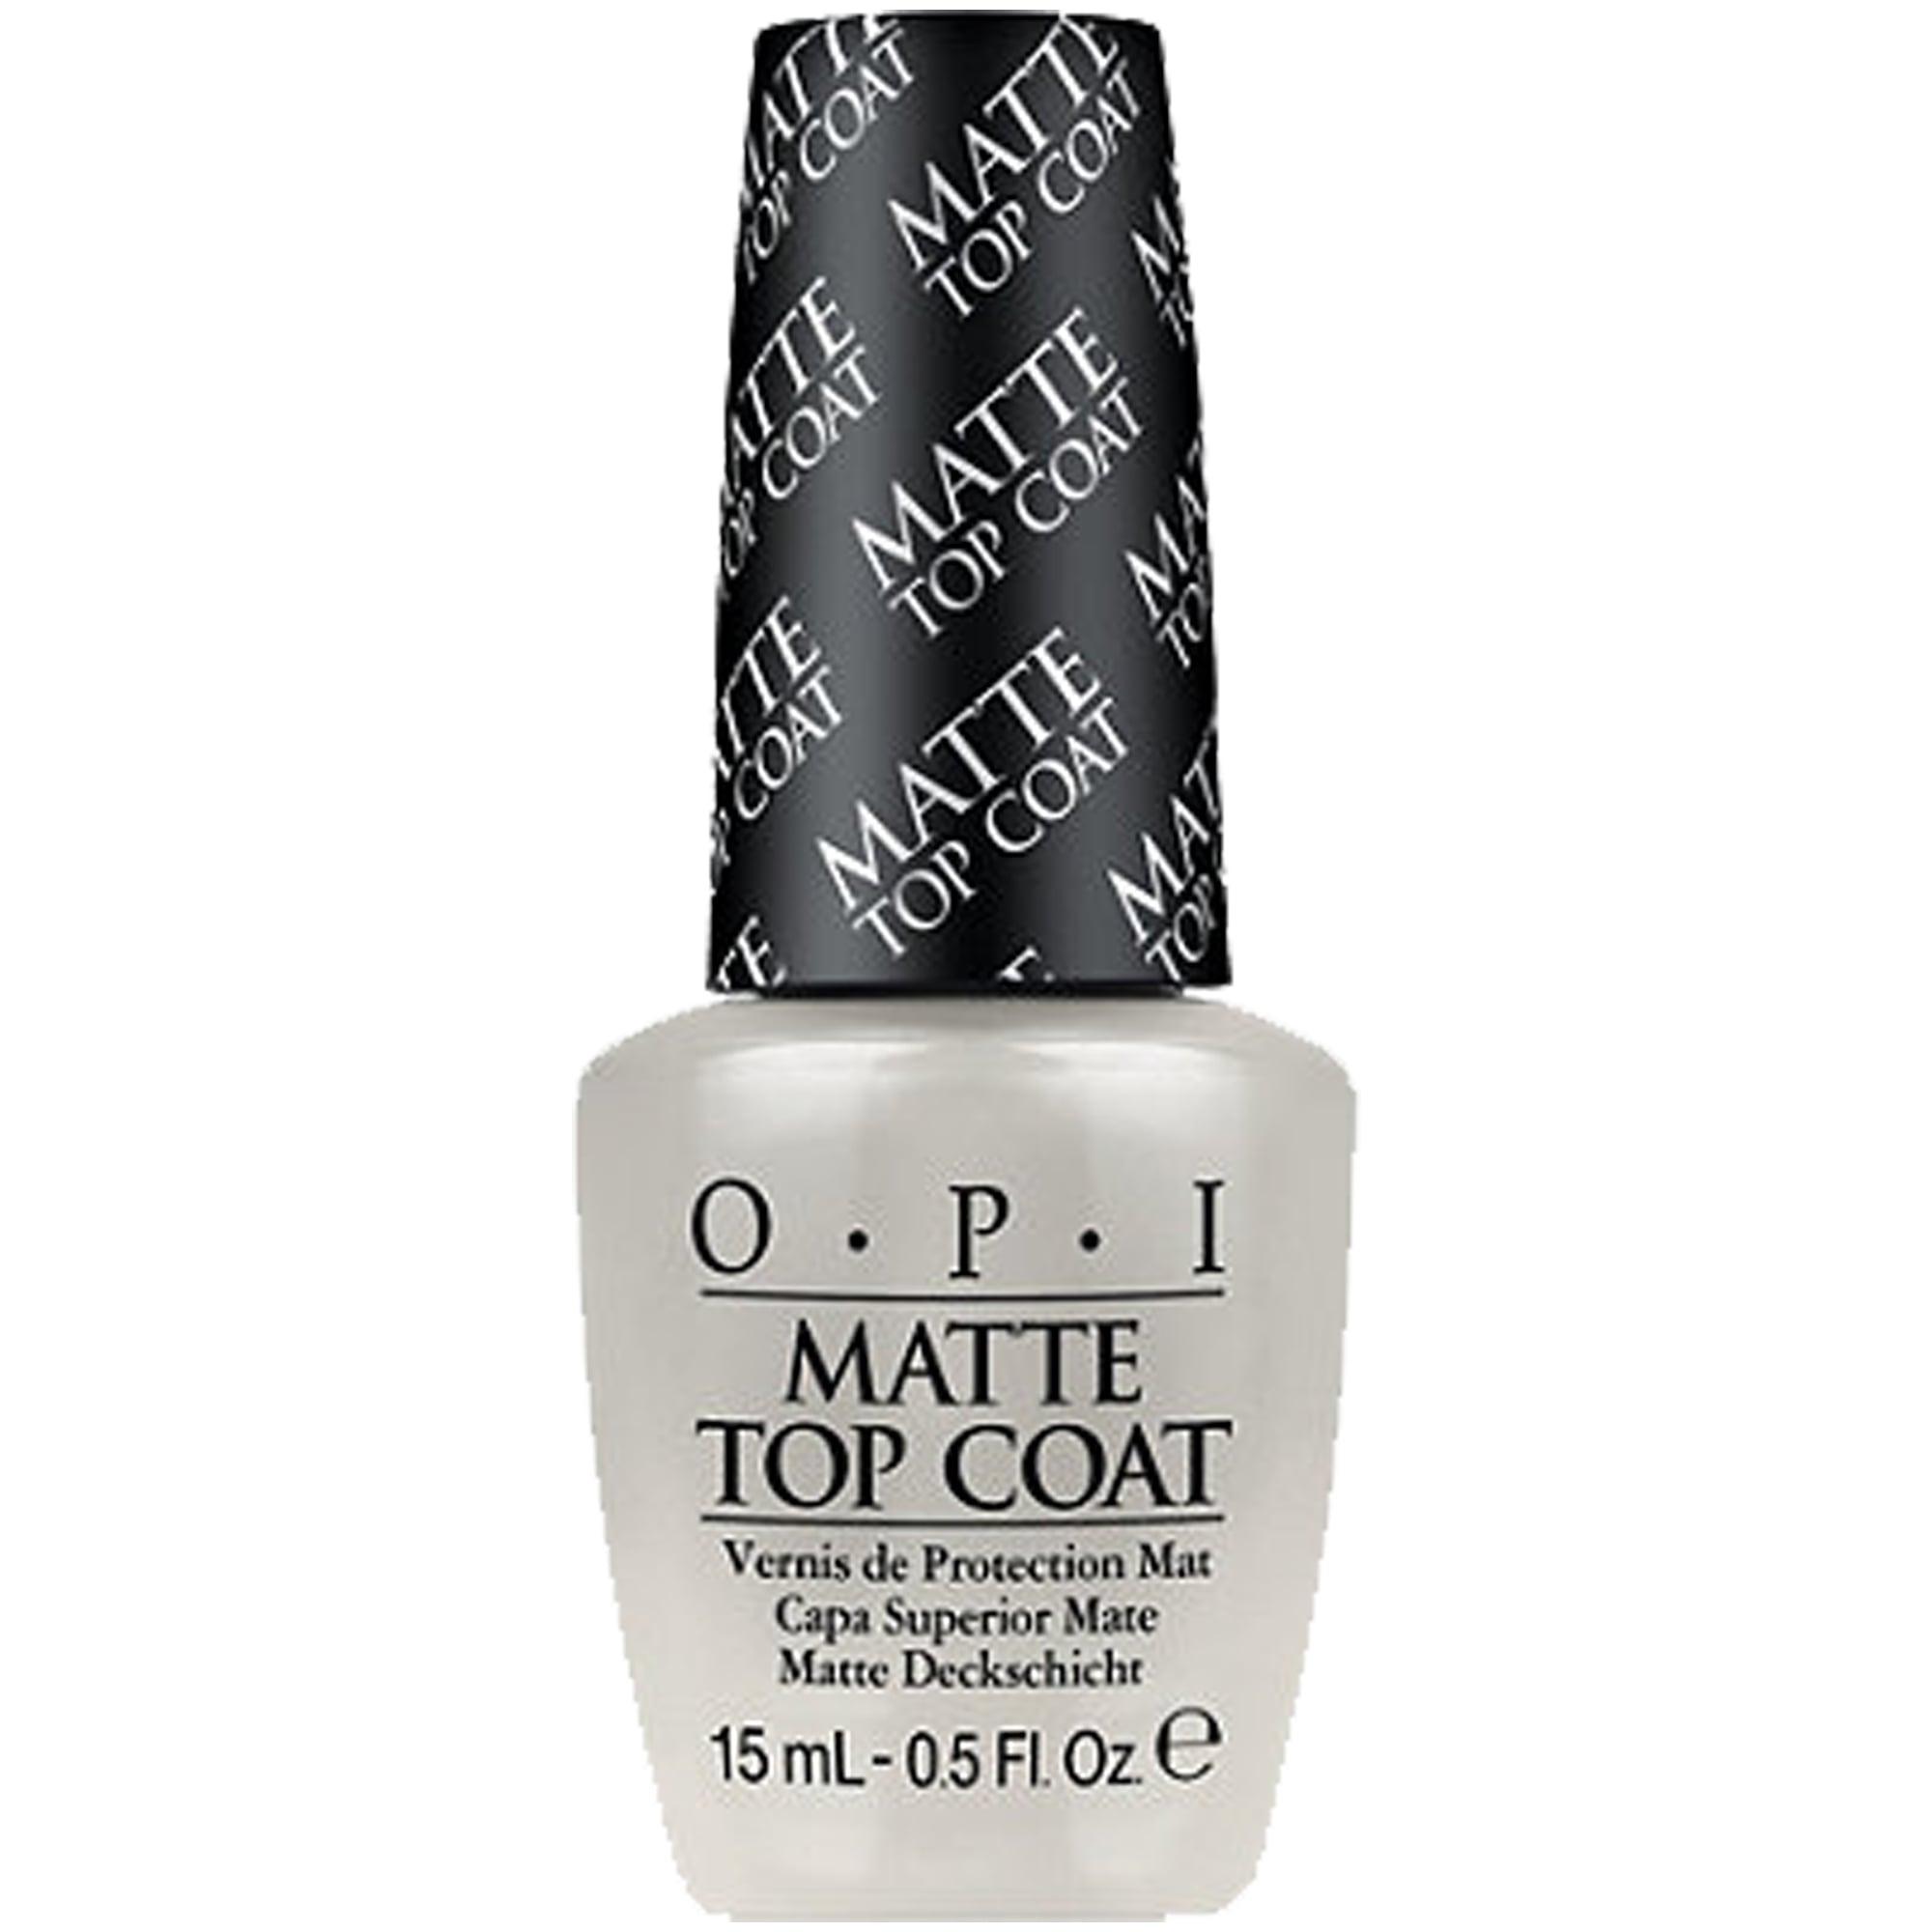 Opi Nail Polish Matte Top Coat Nt T35 15ml